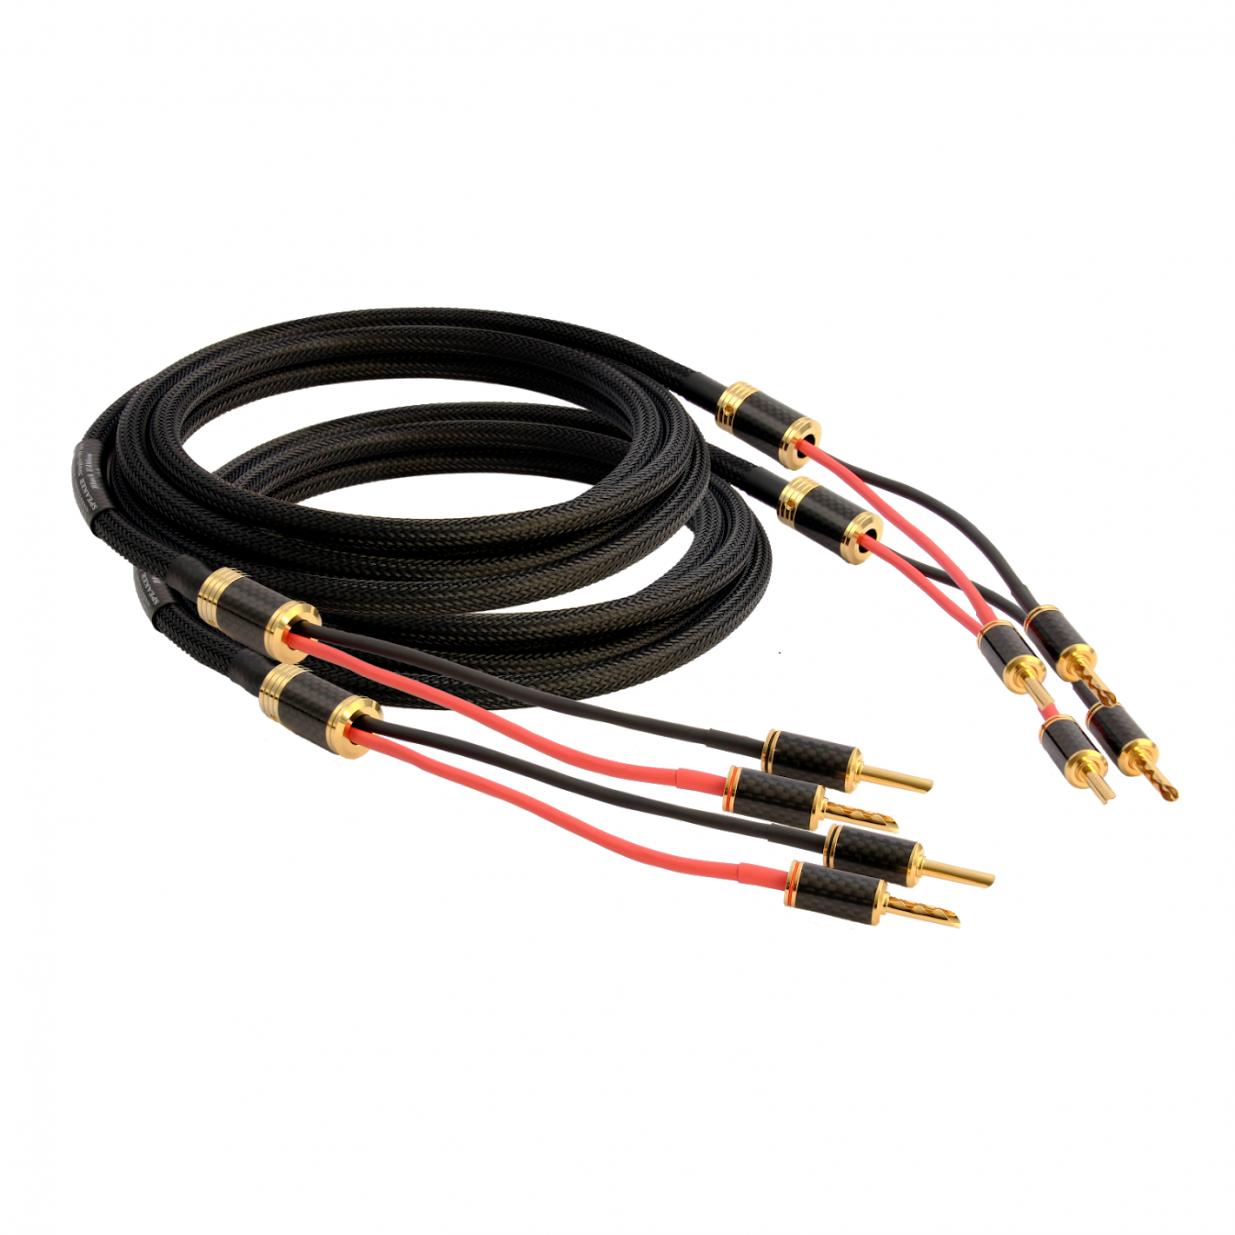 Кабель акустический Goldkabel Black Edition SC Single-Wire 3m